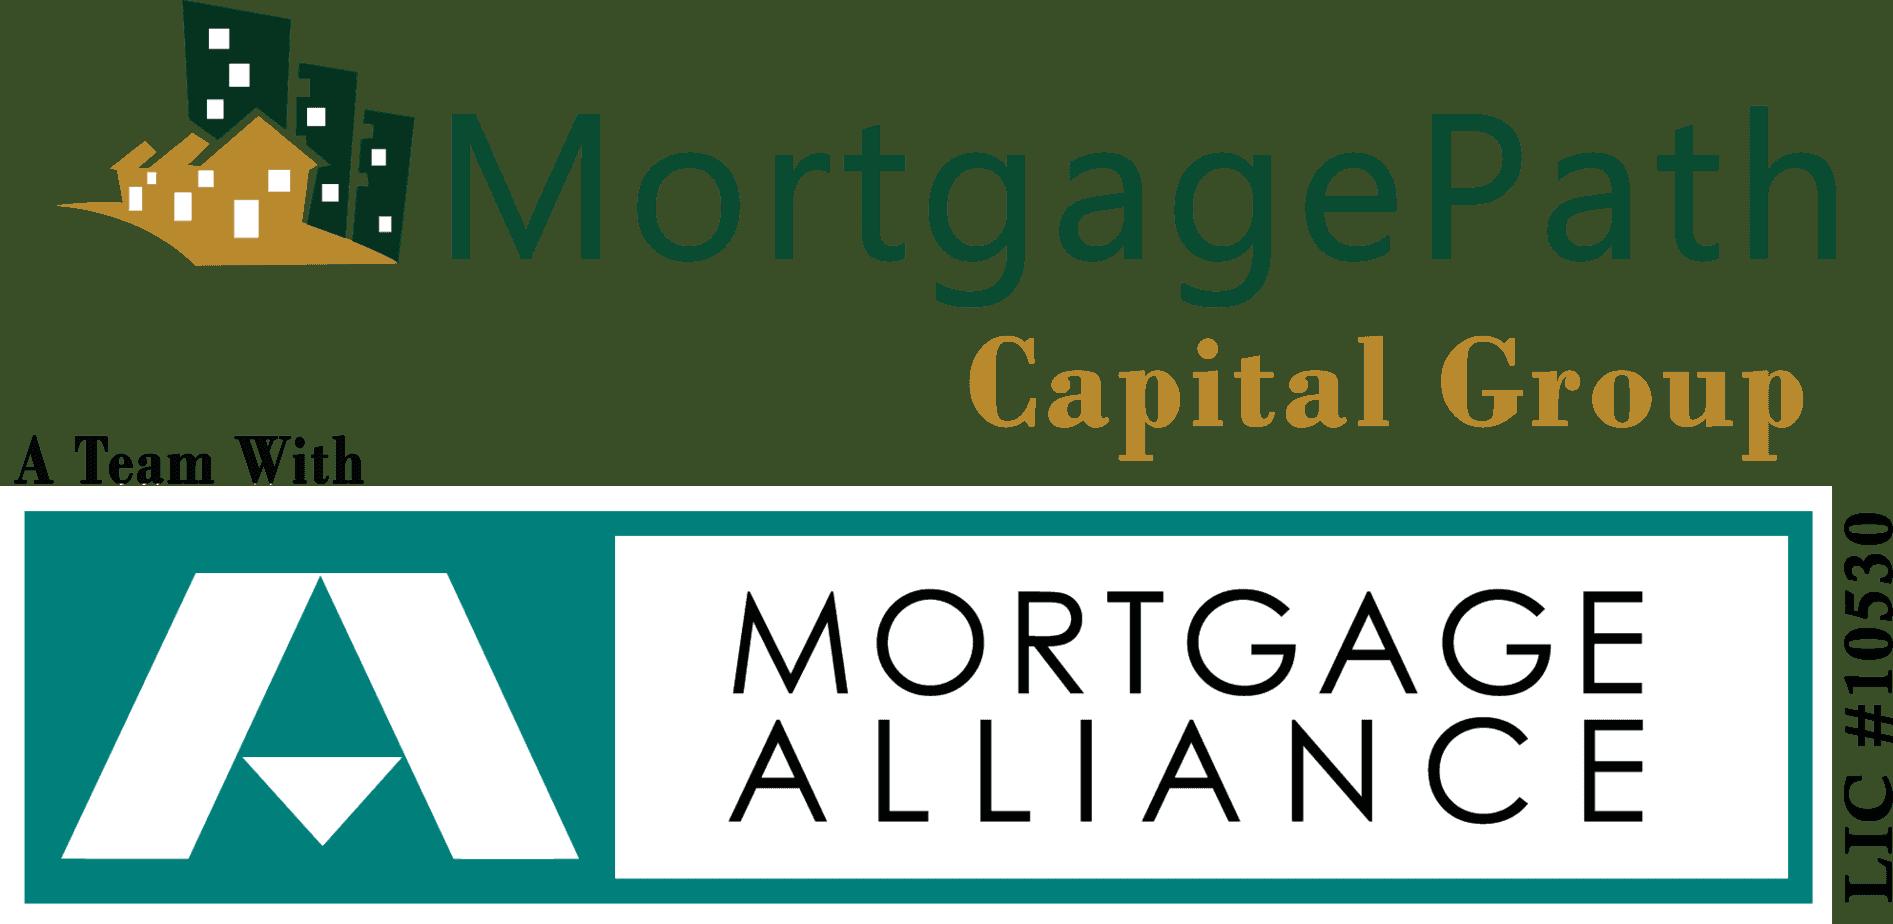 MortgagePath Capital Group